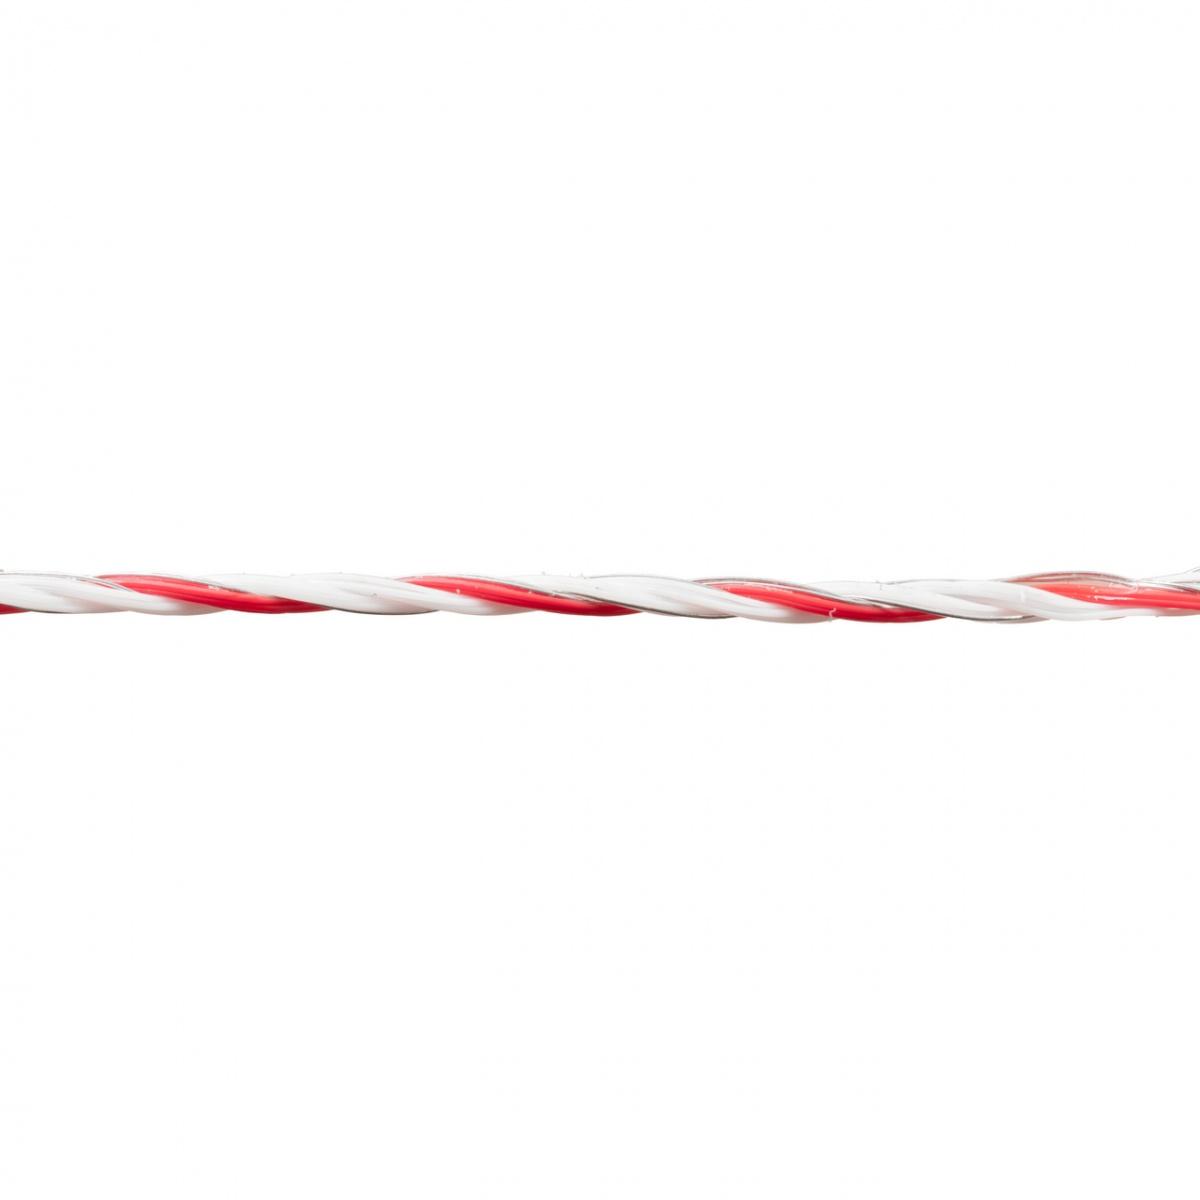 Villanypásztor zsinór - 1000m - 95kg - 0,5Ω/m